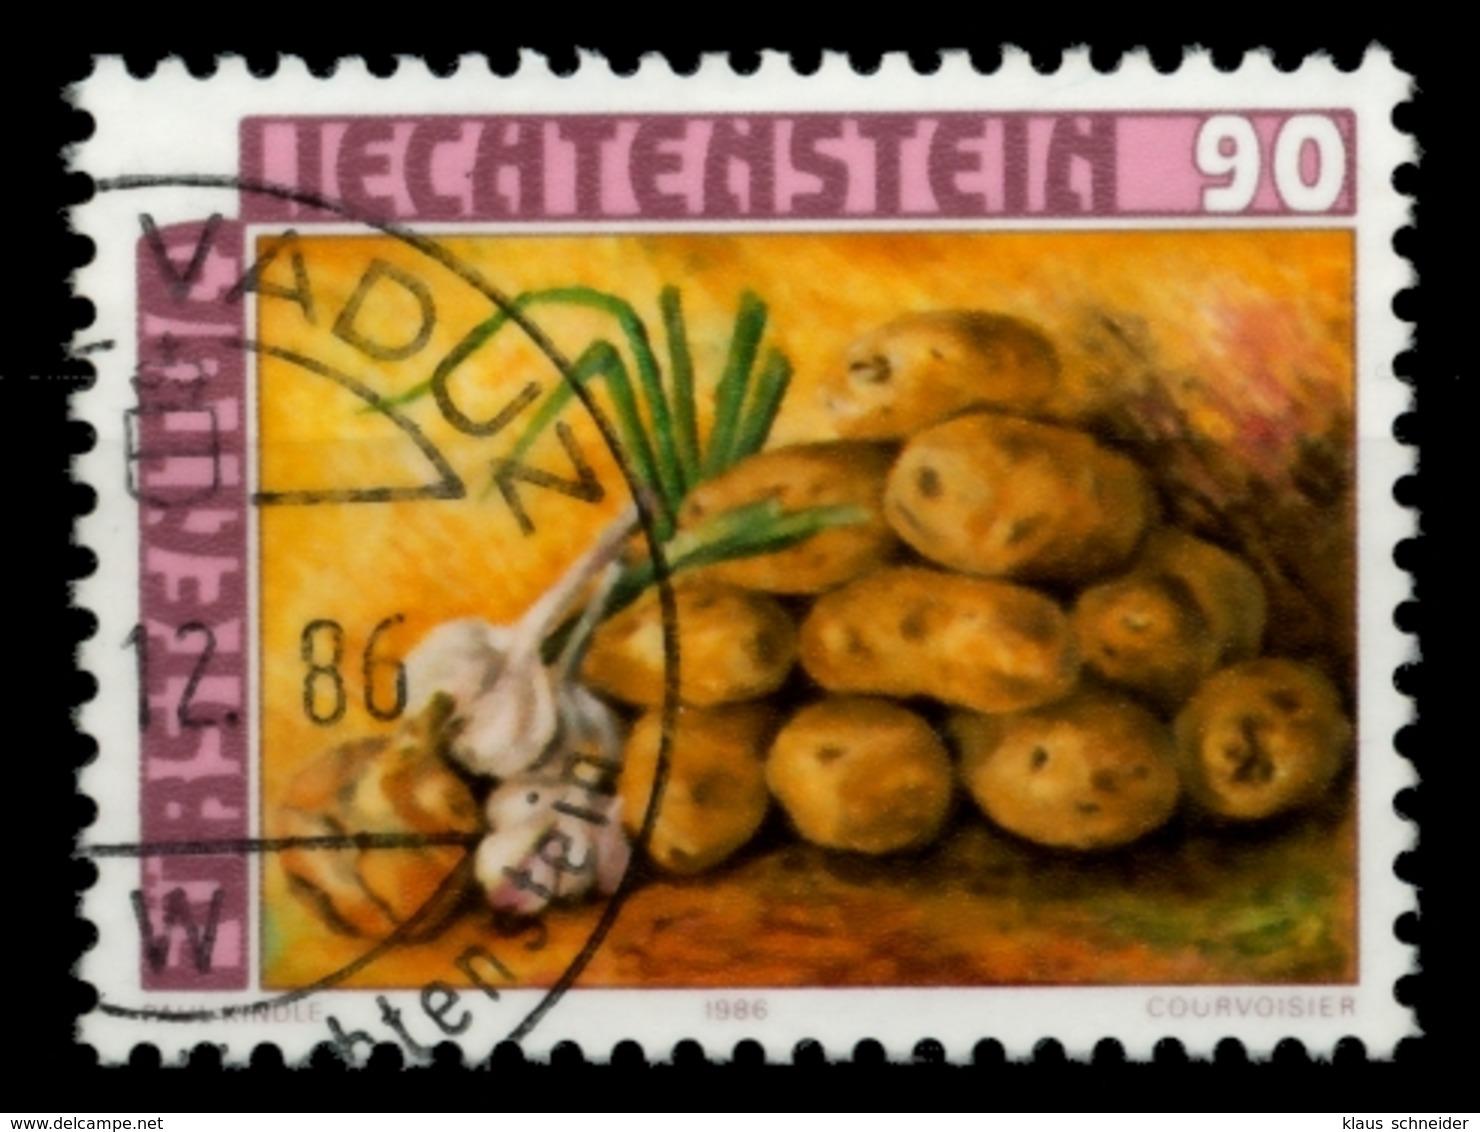 LIECHTENSTEIN 1986 Nr 906 Zentrisch Gestempelt X6E6622 - Liechtenstein